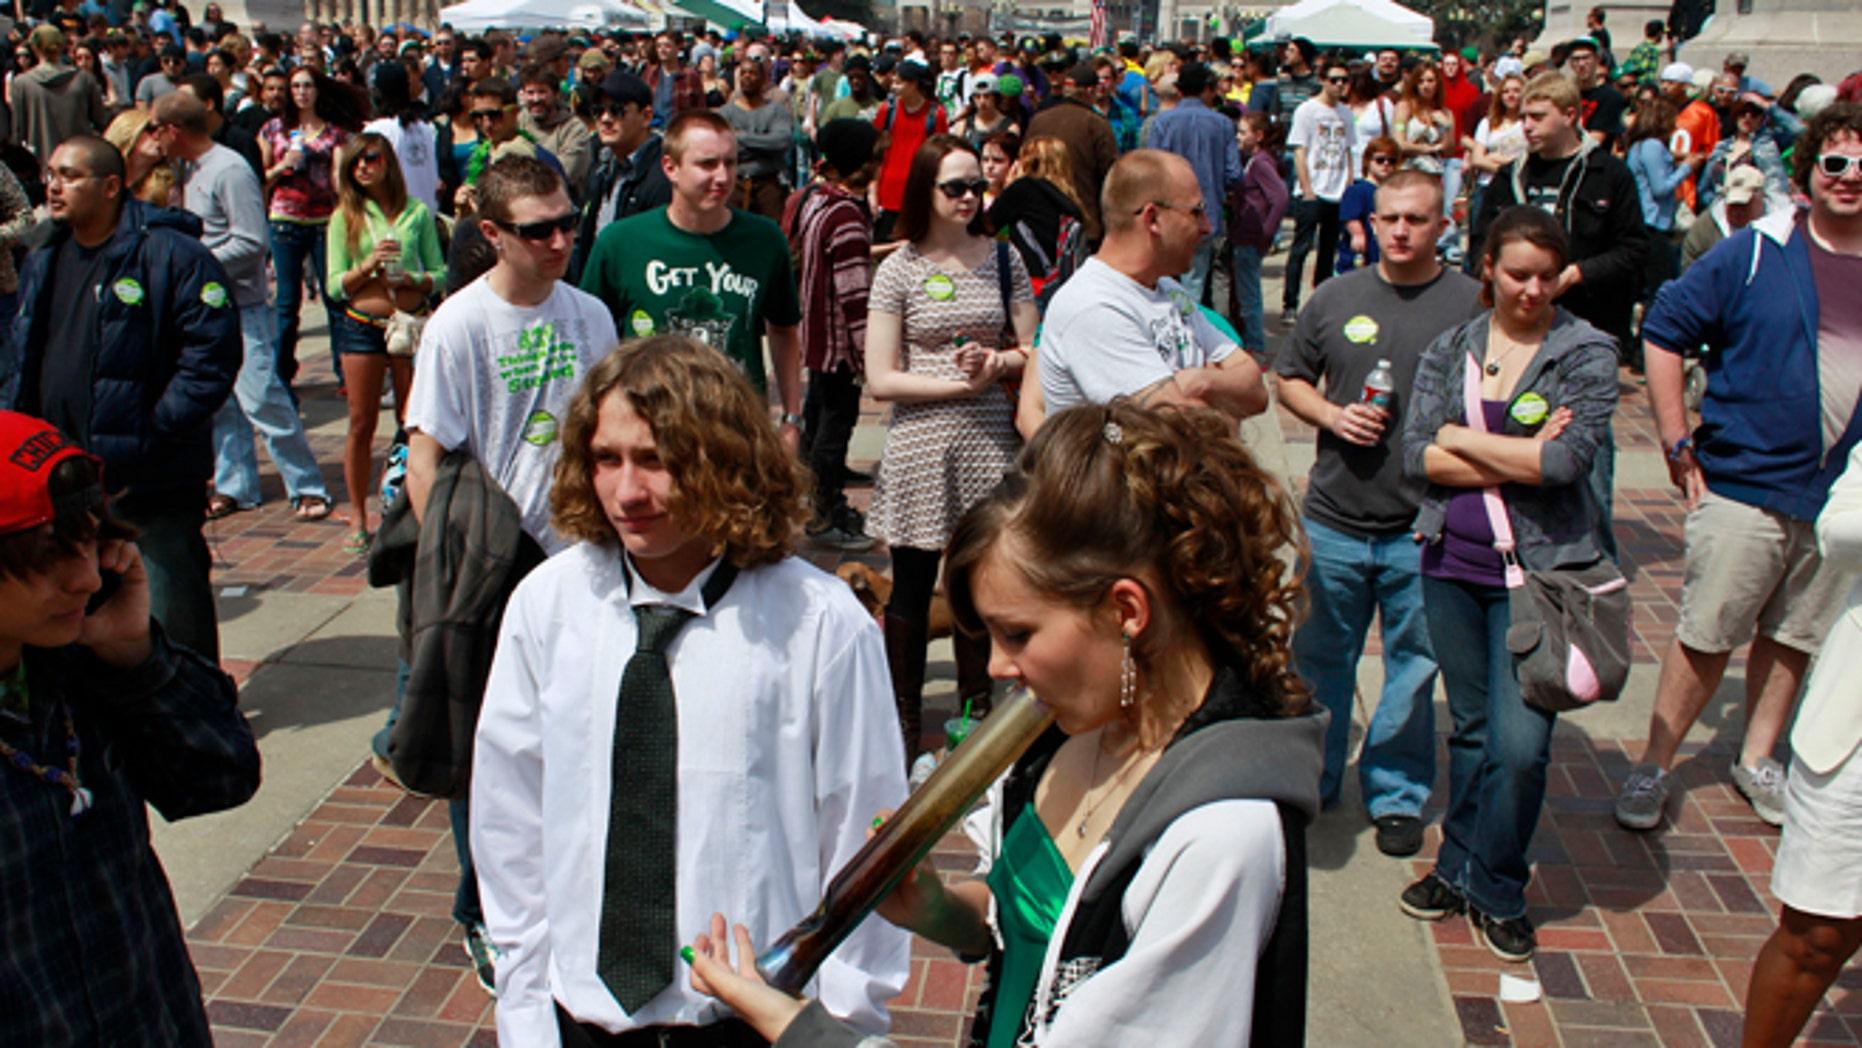 April 20, 2013: Youths smoke marijuana at the Denver 4/20 pro-marijuana rally at Civic Center Park in Denver.